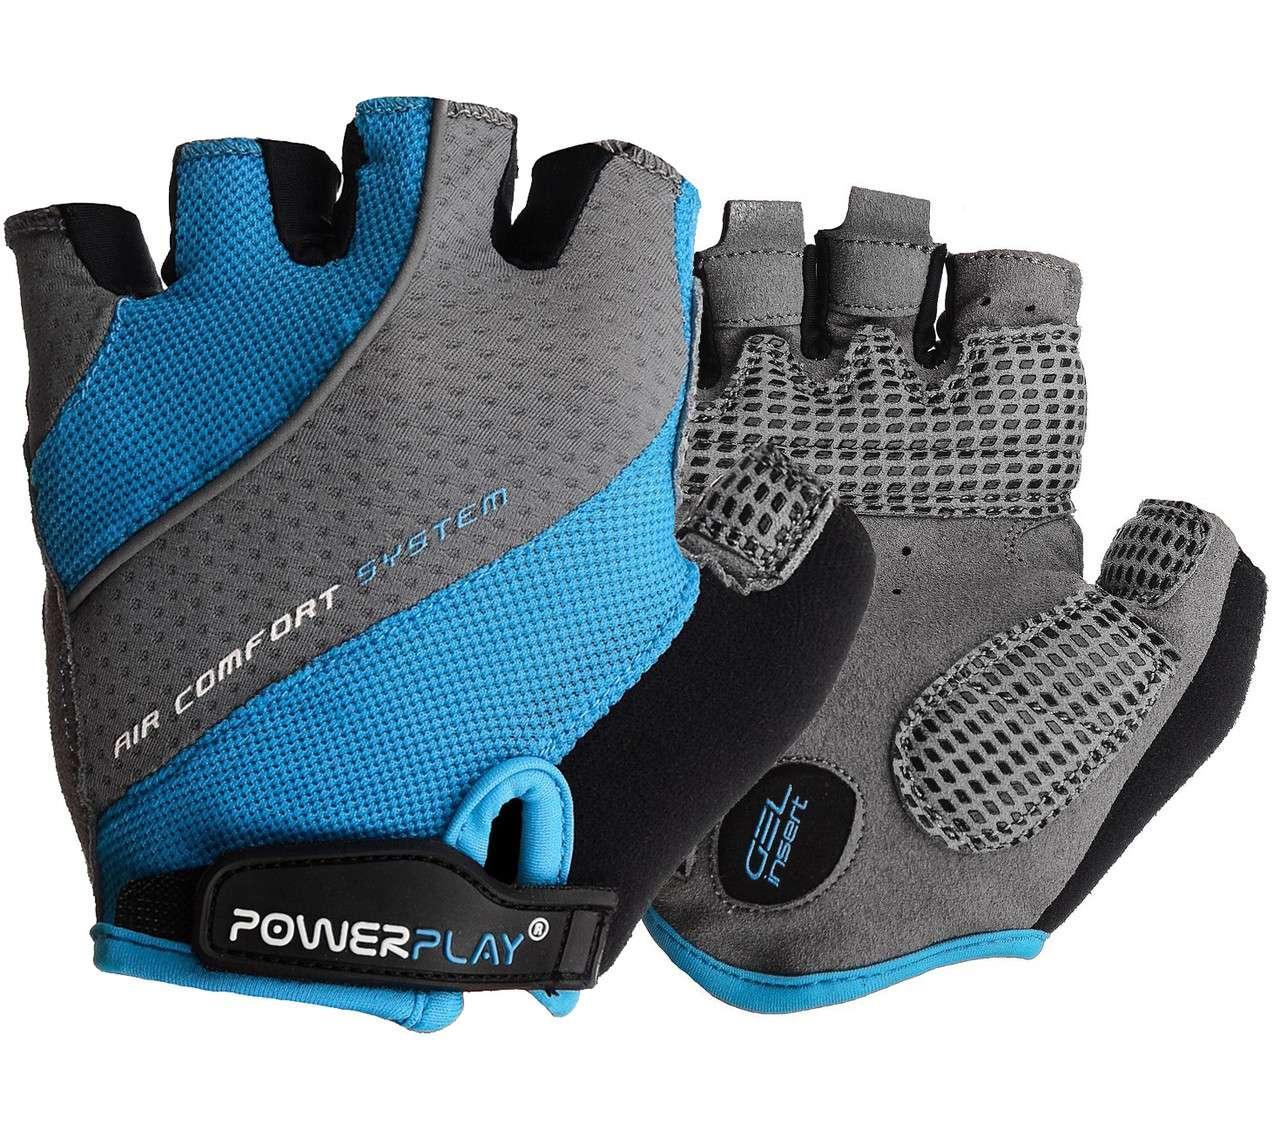 Велорукавички PowerPlay 5023 Блакитні S - 144317